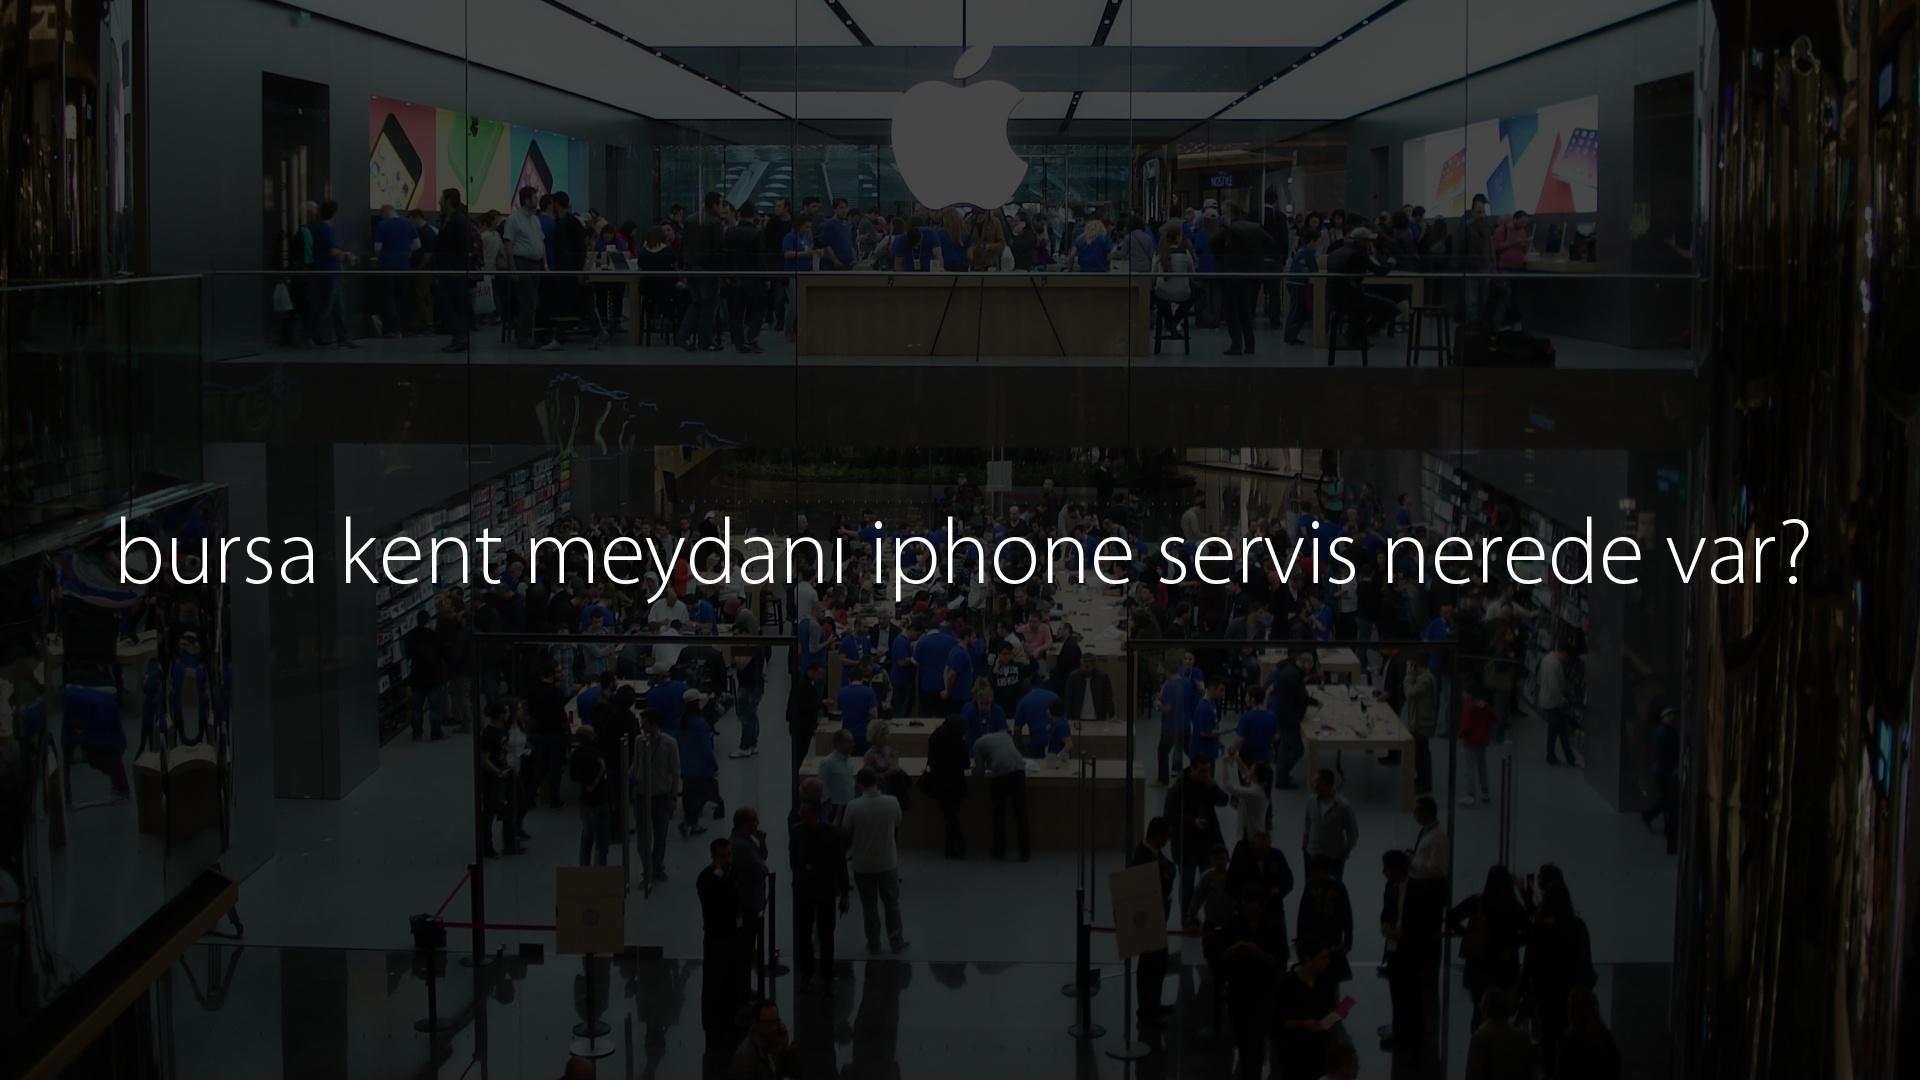 bursa kent meydanı iphone servis nerede var?